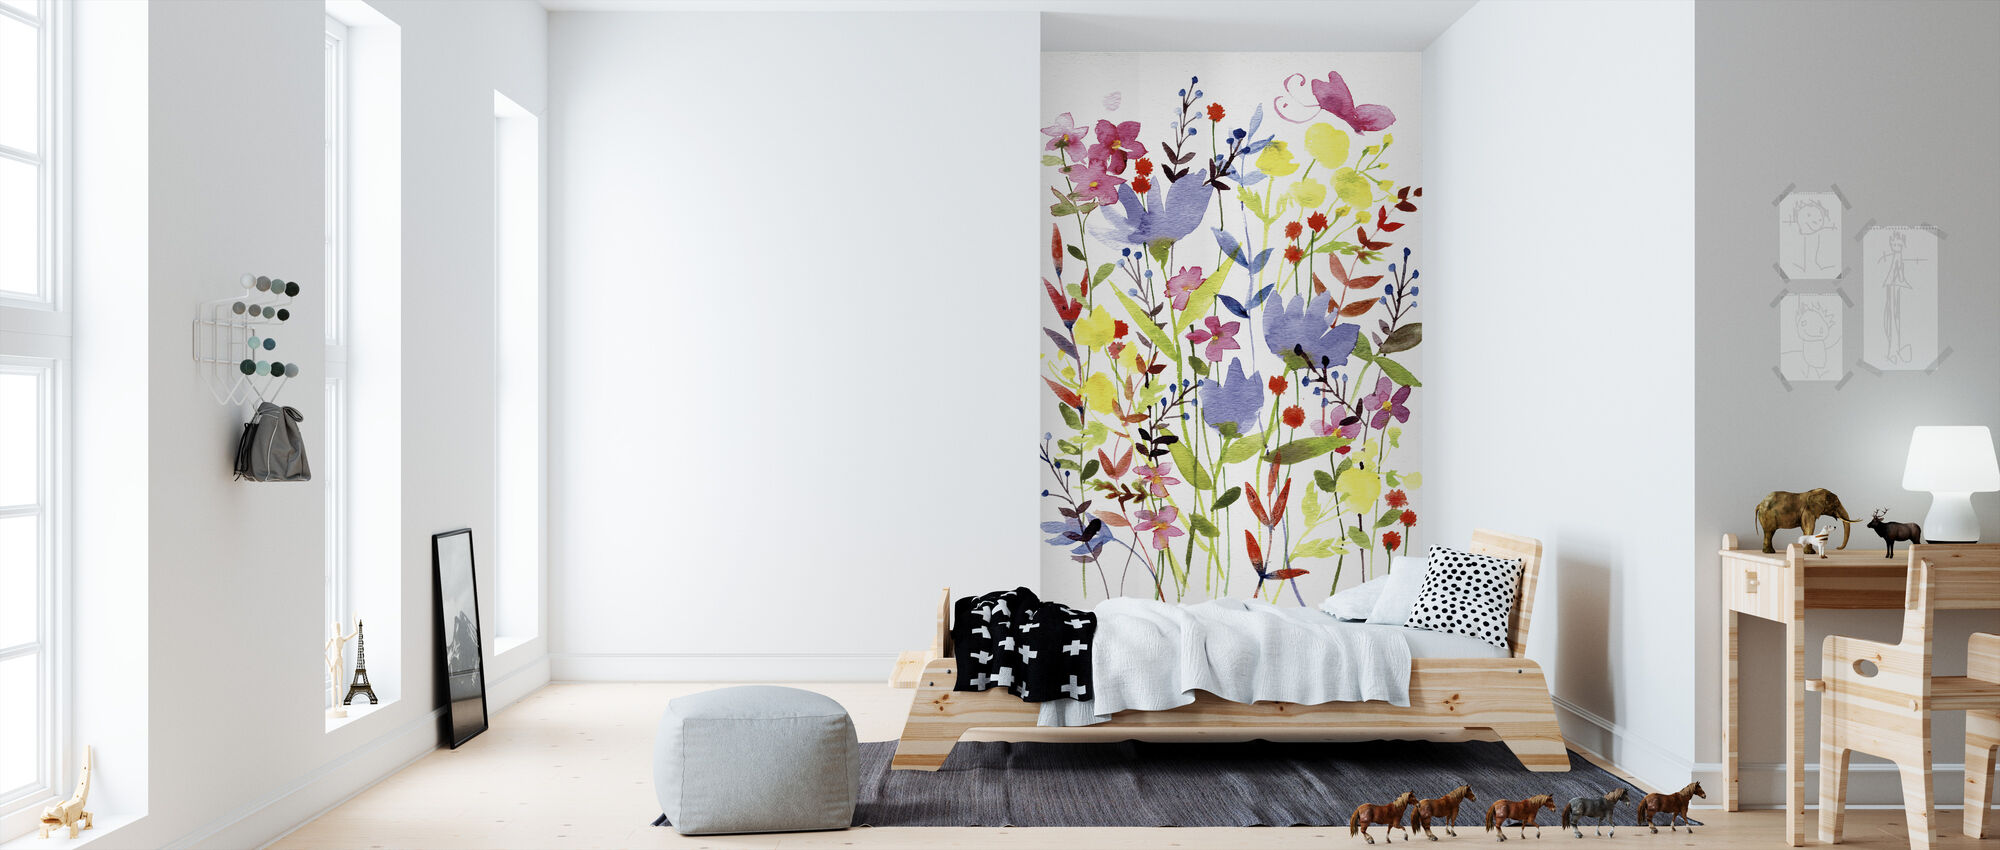 Annes Flowers - Wallpaper - Kids Room